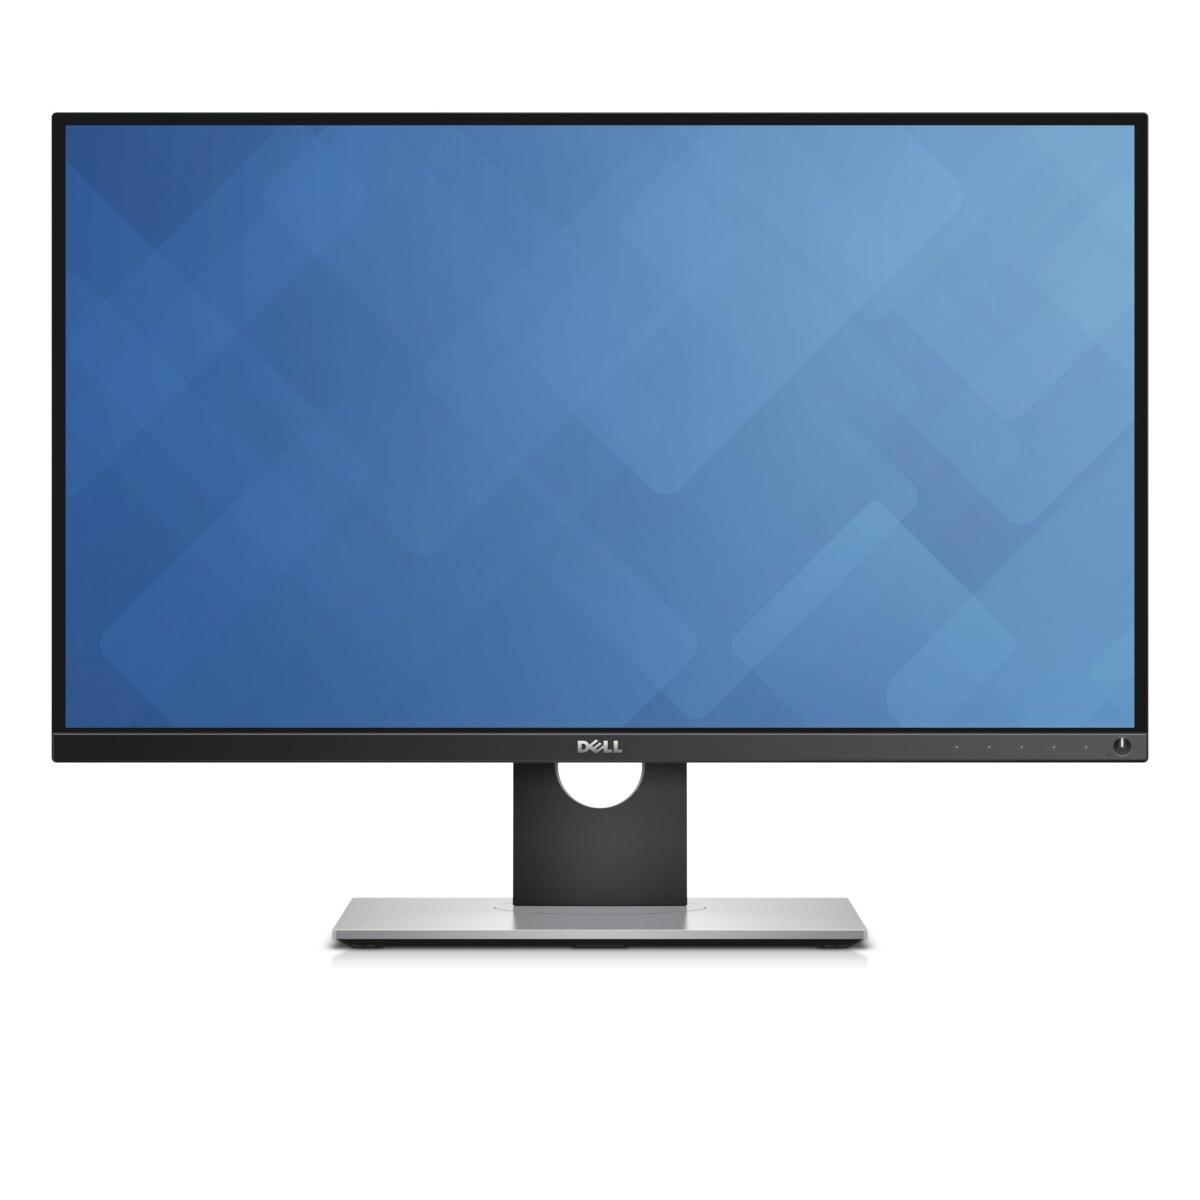 monitor-27-up2716d-premiercolor-qhd-2560x1440-1692-xhdmimdpdp6xusb-3-03y-ppg